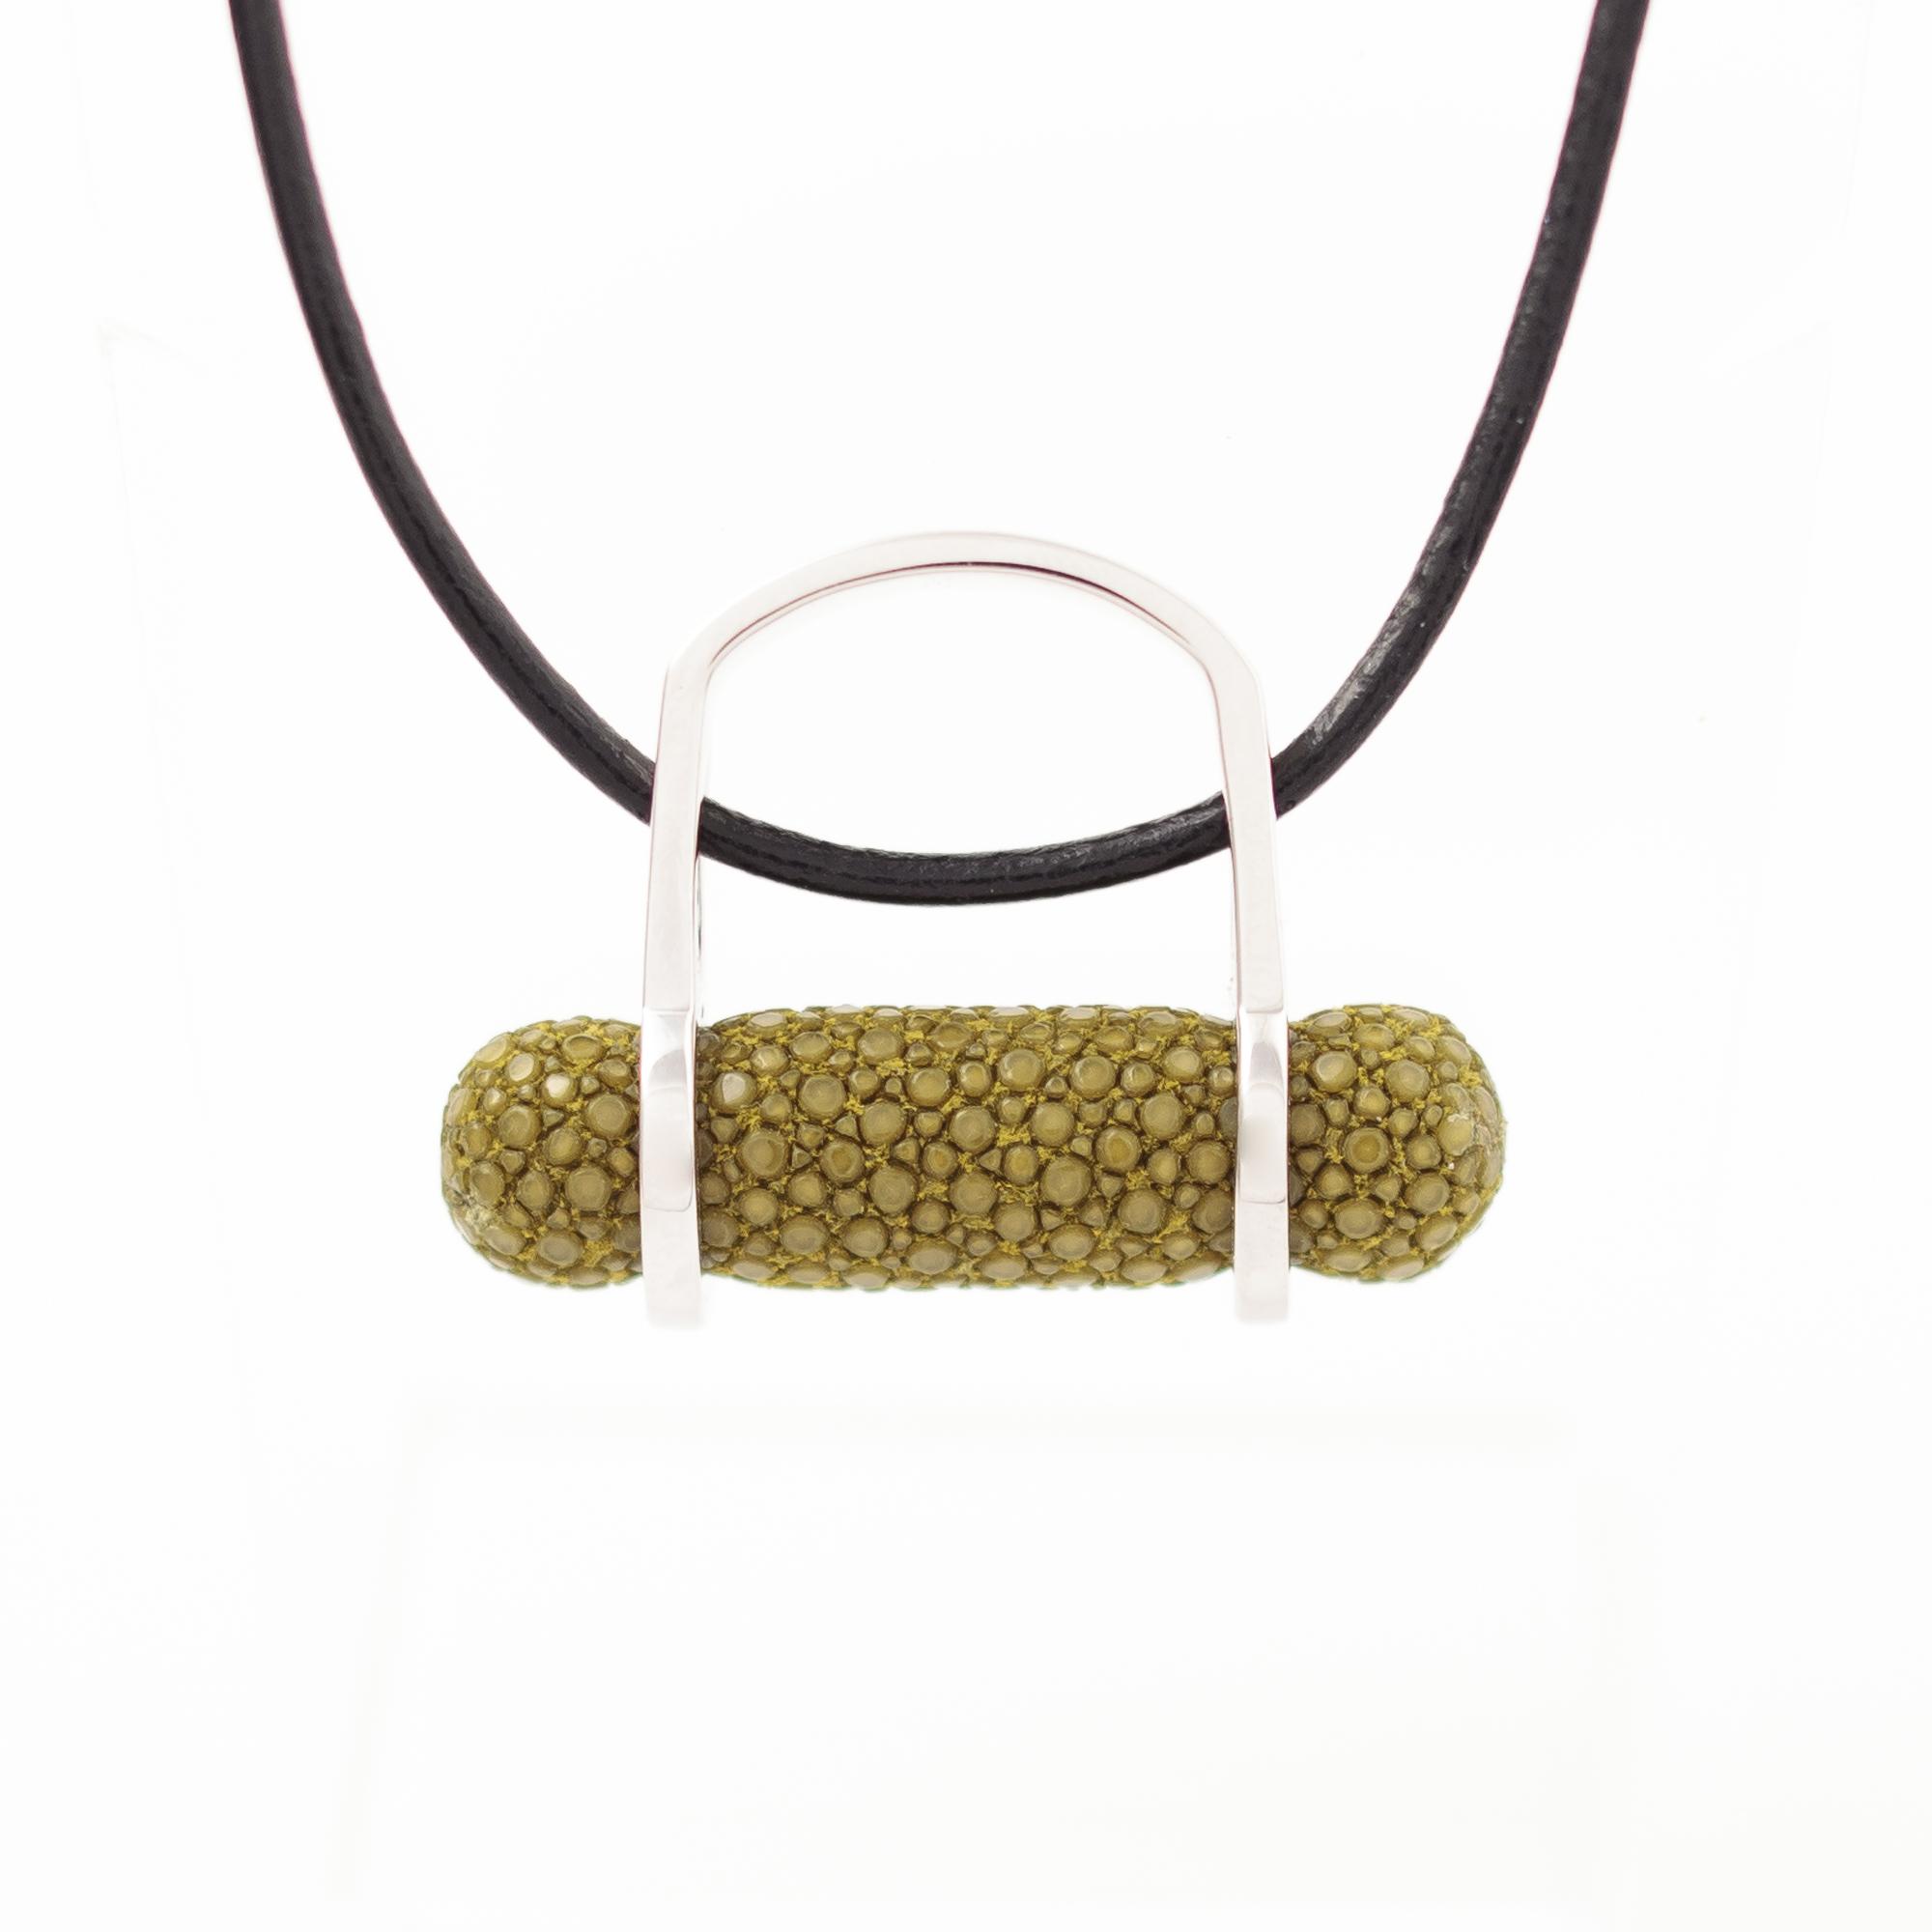 tresor-by-flore-galuchat-bague-pendentif-ogive-kiwi2